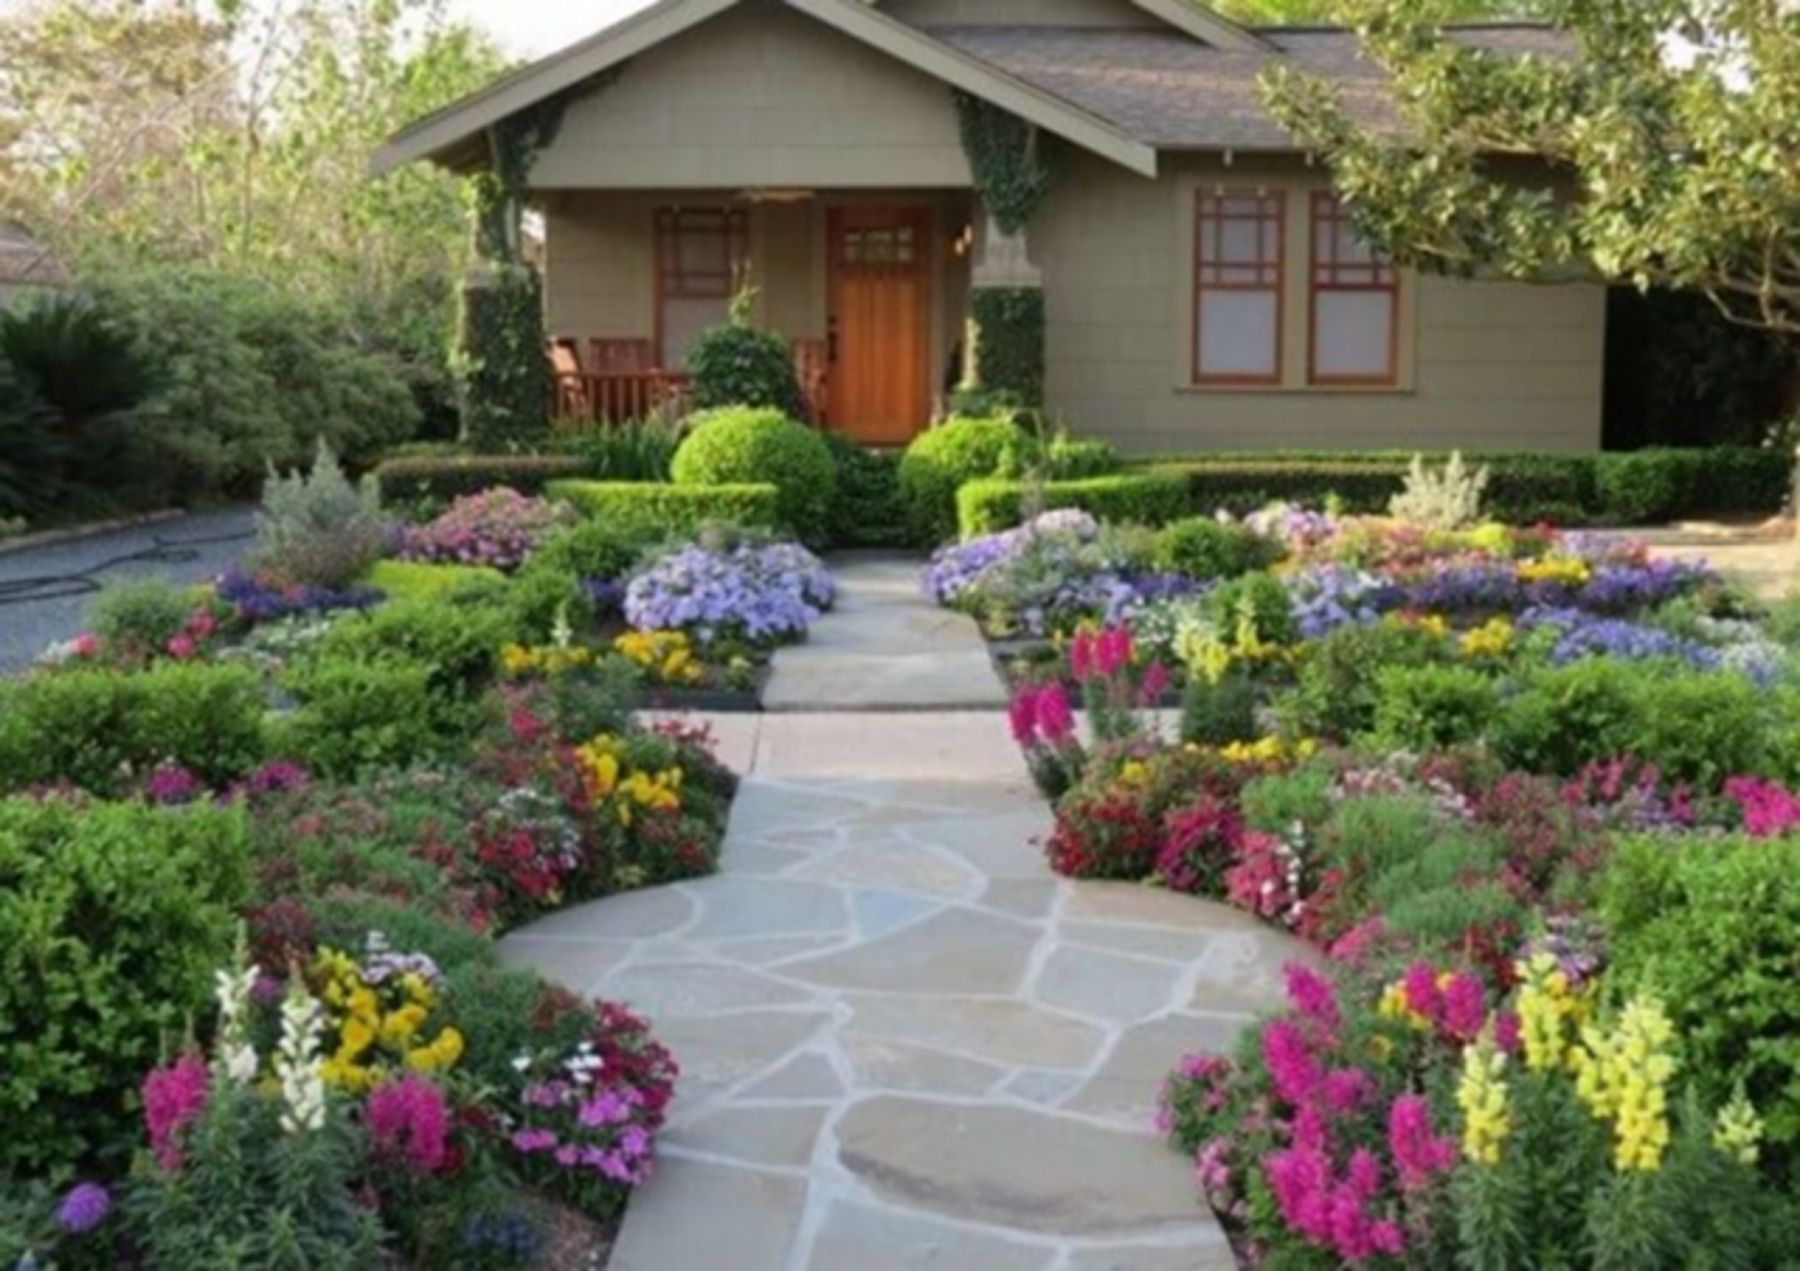 55 Cool Small Courtyard Garden Design Ideas For You 55 Viilea Pienia Sisapihalla Ideat In 2020 Courtyard Gardens Design Small Courtyard Gardens Side Yard Landscaping